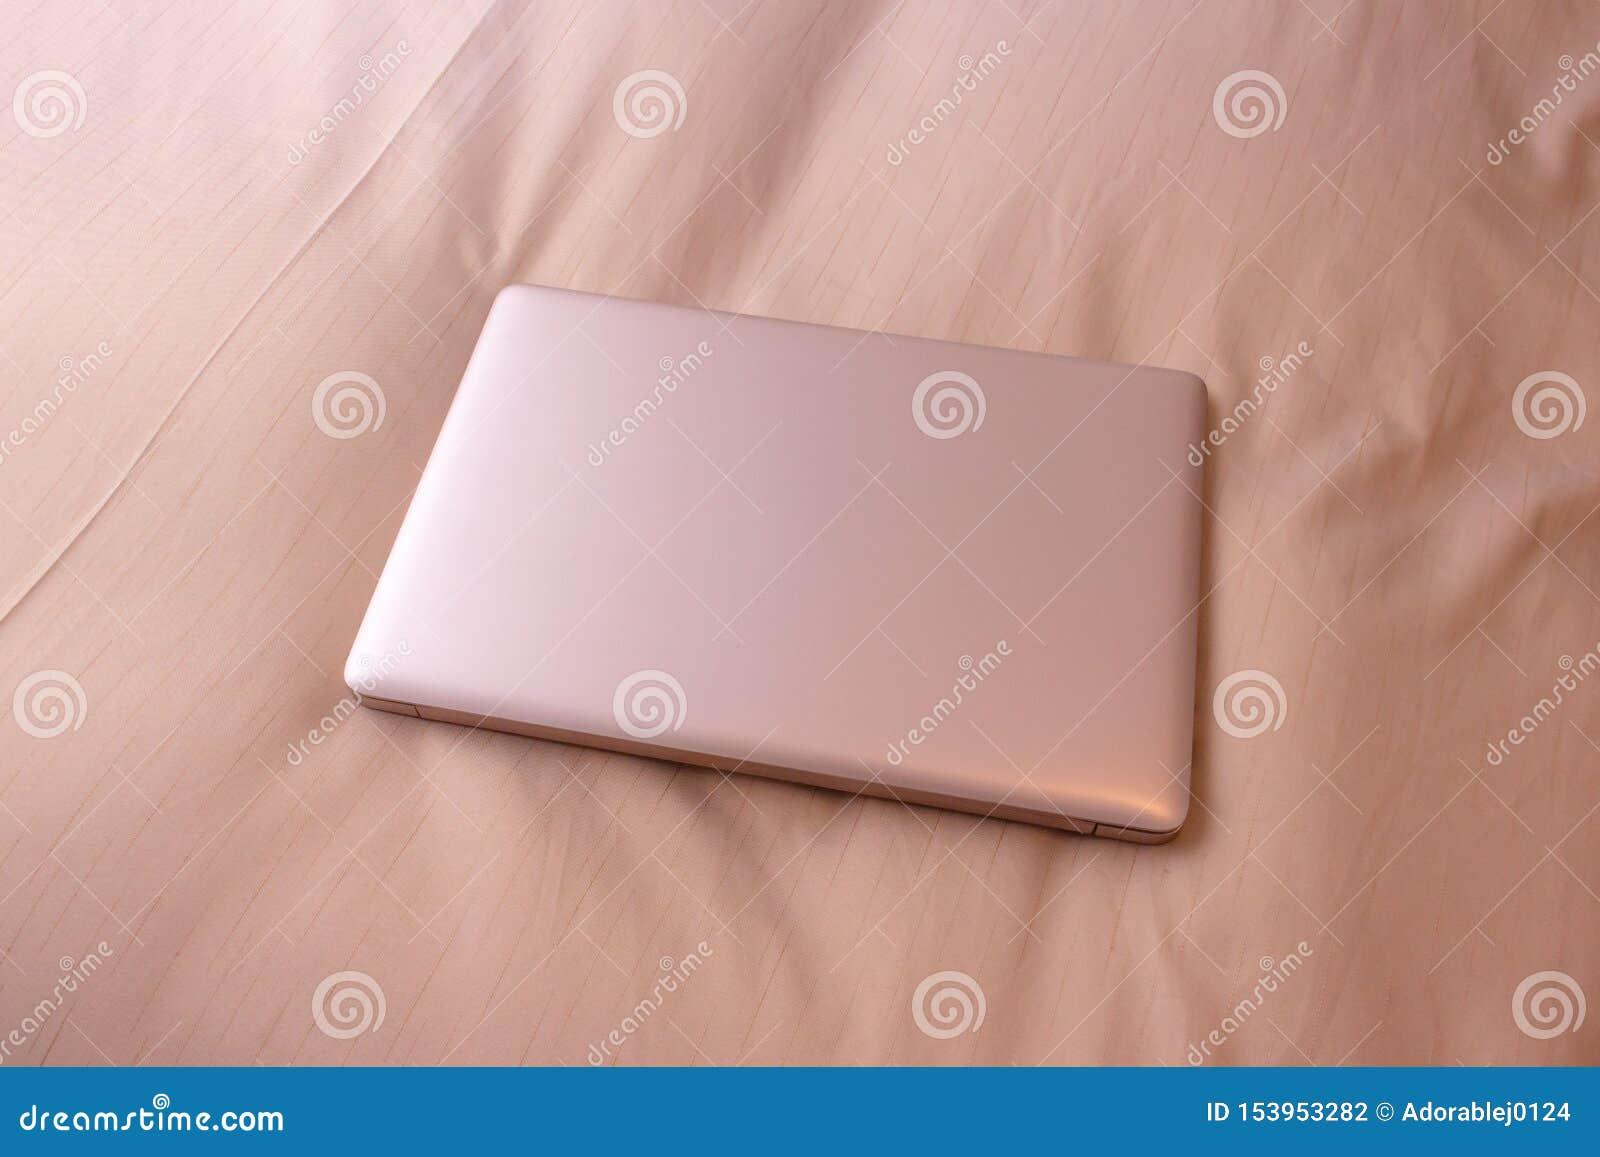 Laptop auf dem Bett, Geschäftsreise